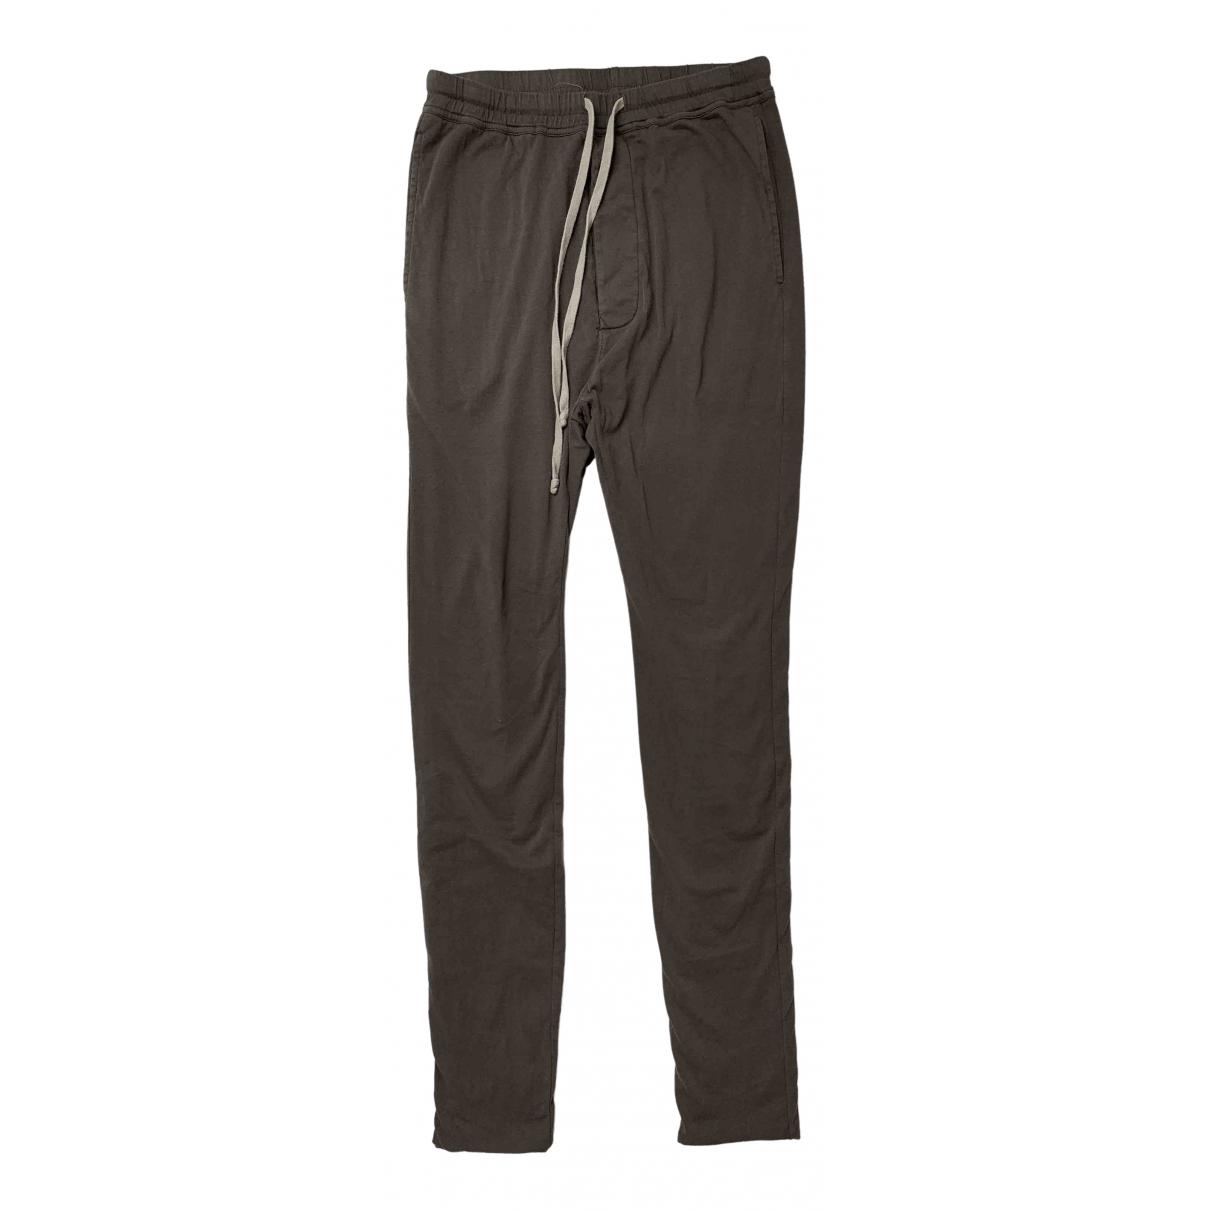 Rick Owens \N Beige Cotton Trousers for Men S International